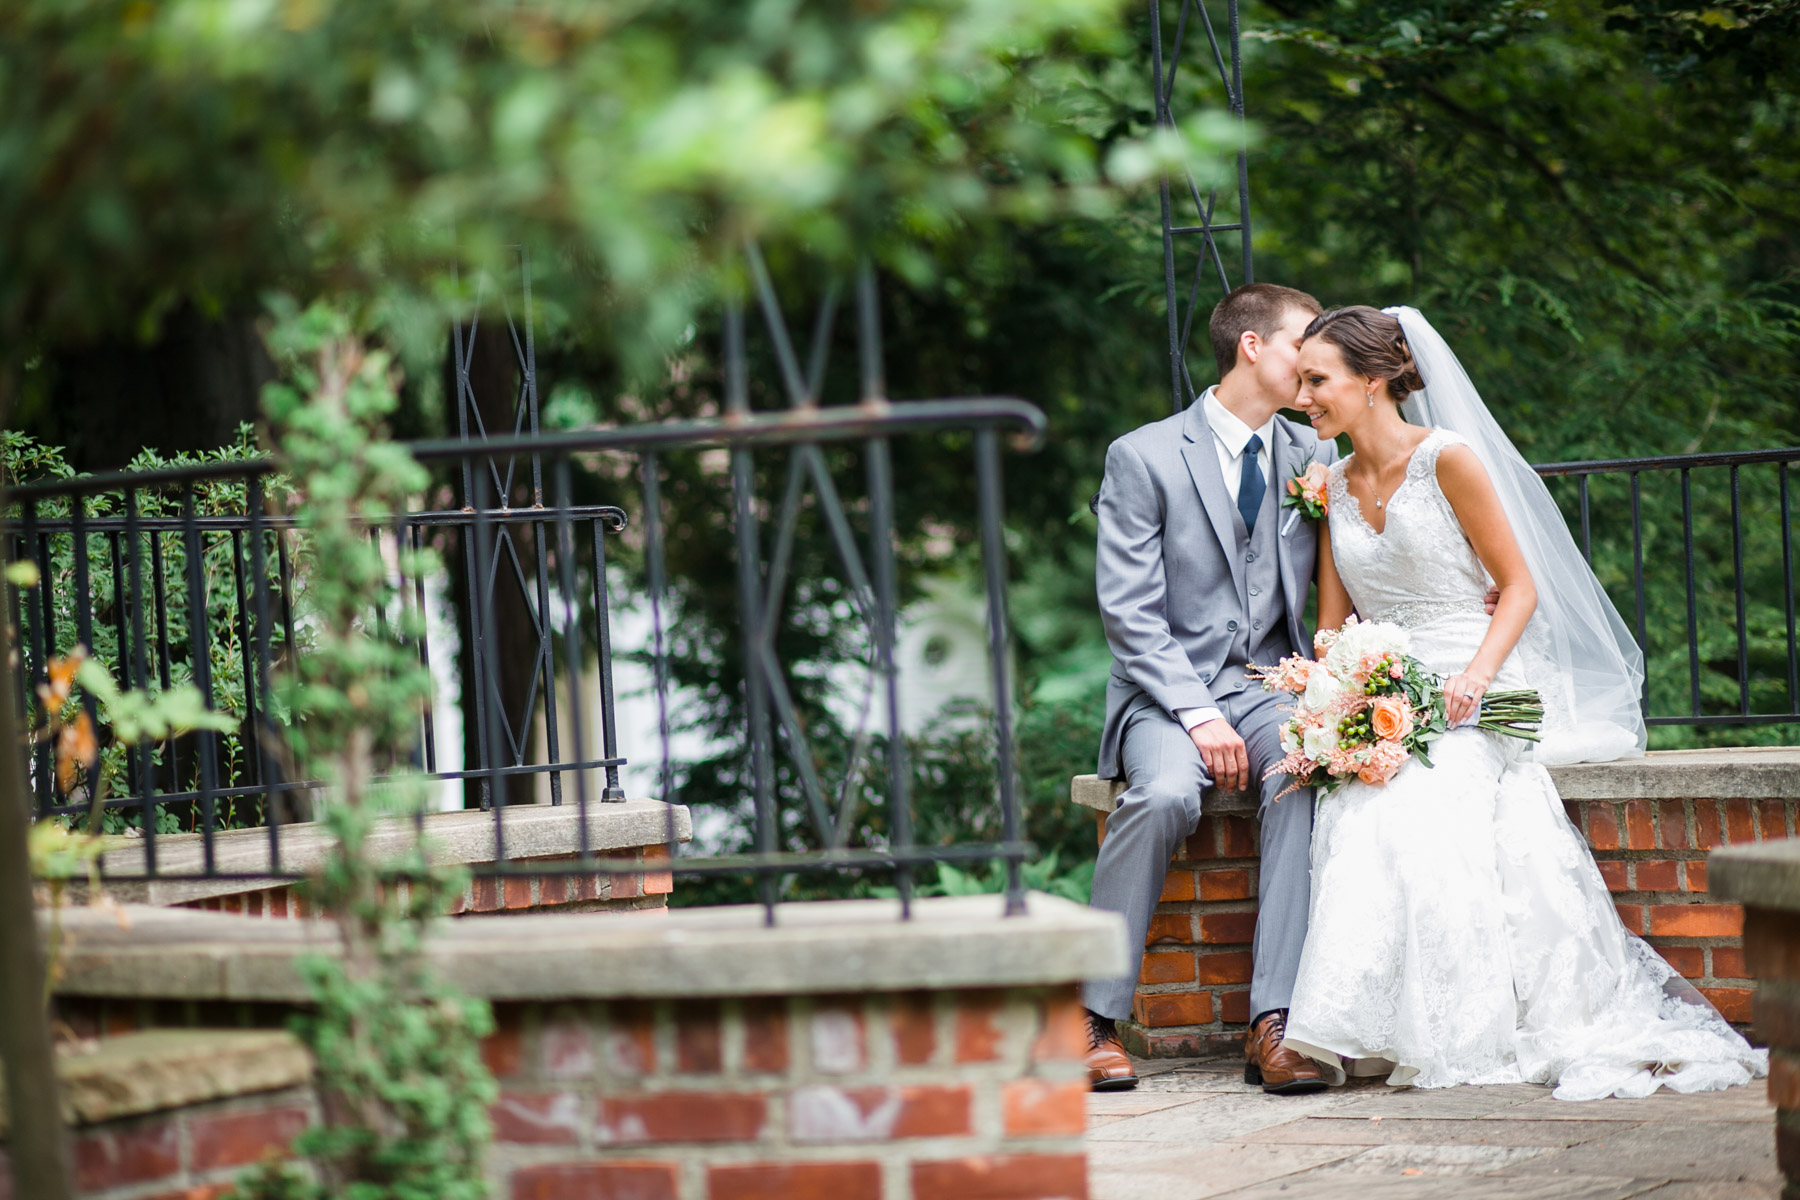 wildwood-park-wedding-photos-55.jpg